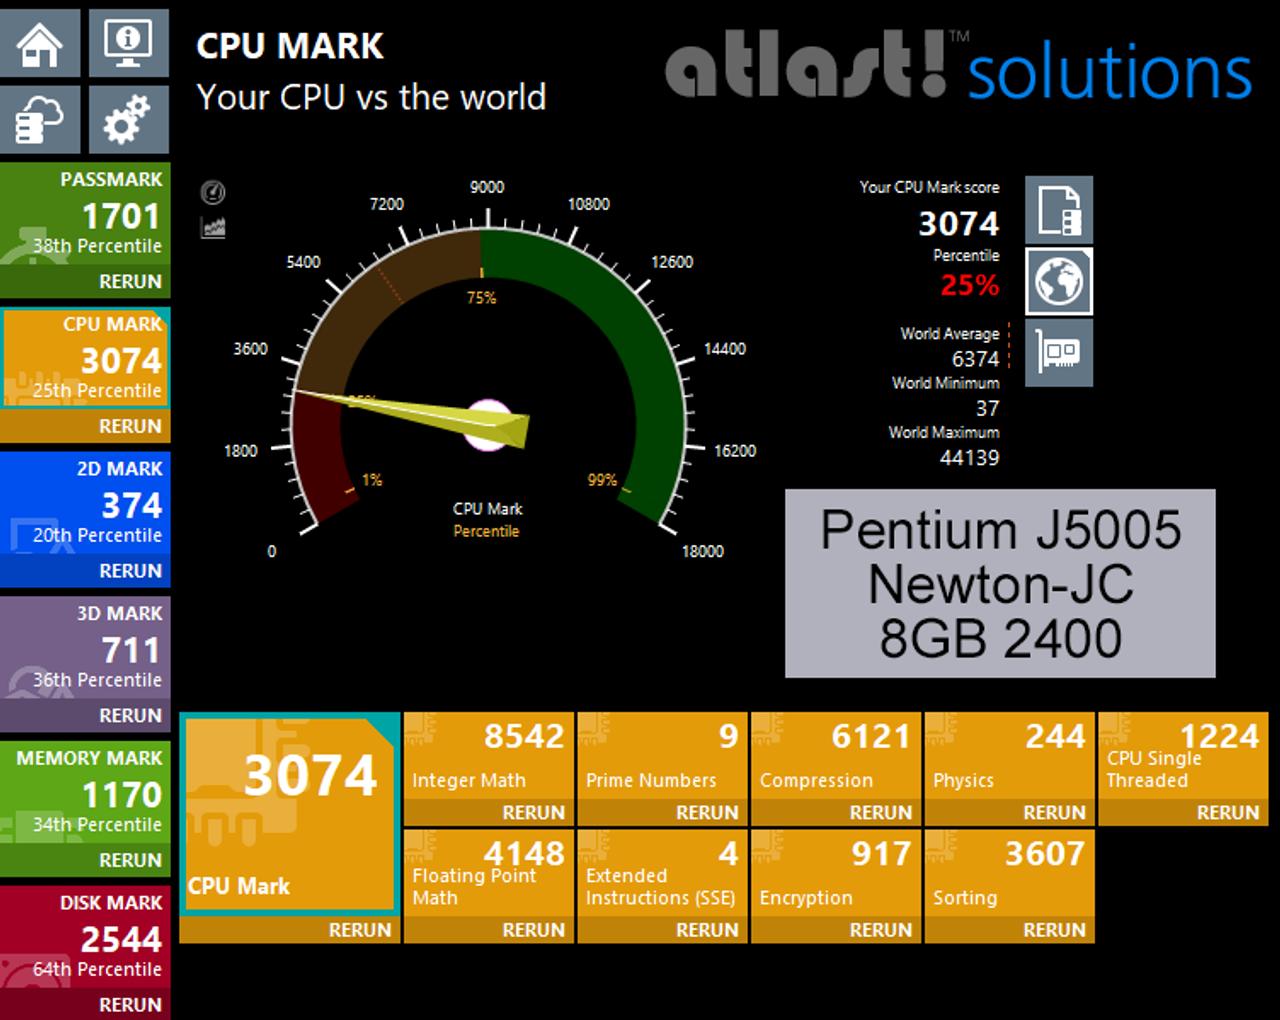 Fanless Quad Core Pentium J5005 NUC PC, 4GB DDR4, 128GB SSD, Dual HDMI 2 0a  [Newton-JC]